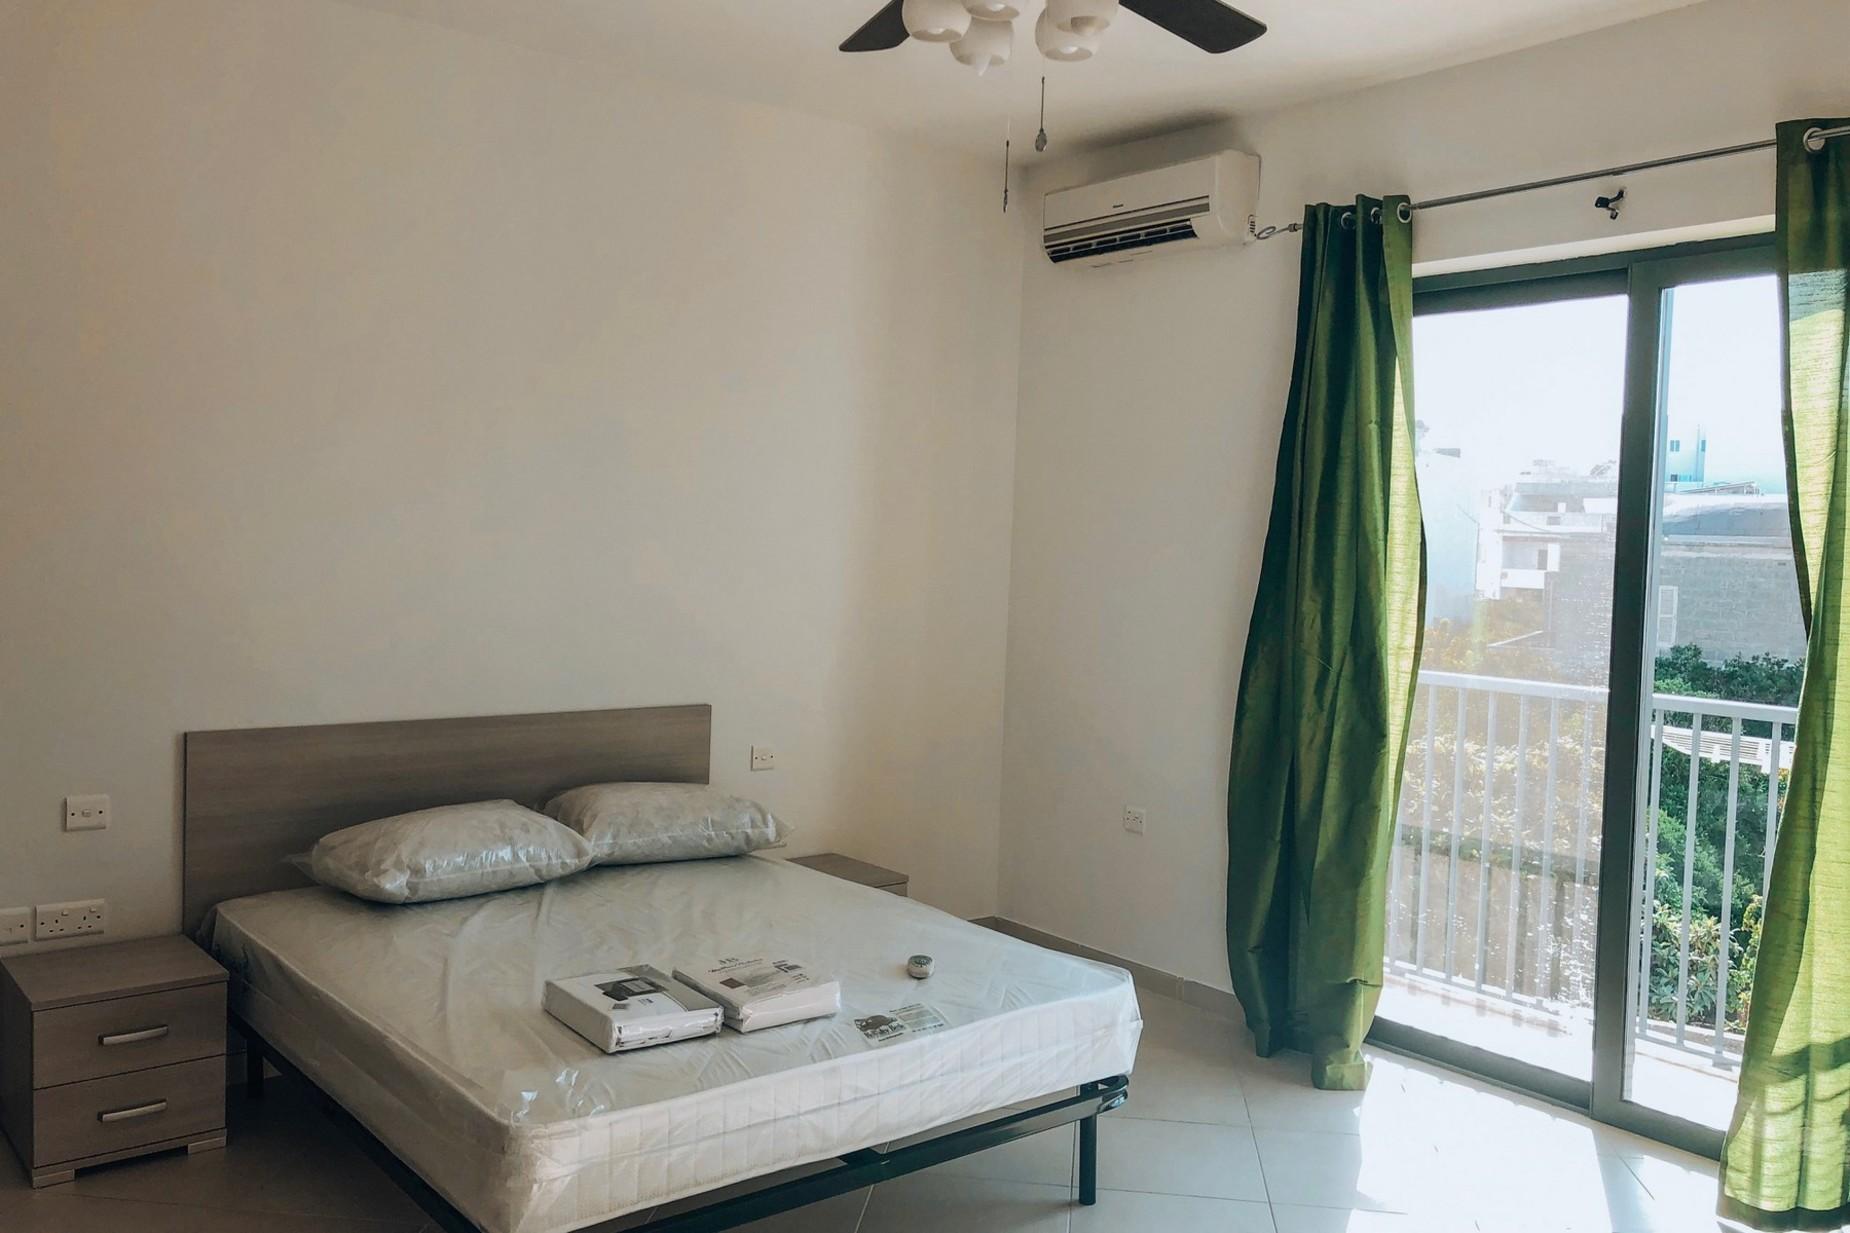 3 bed Apartment For Rent in Balzan, Balzan - thumb 5